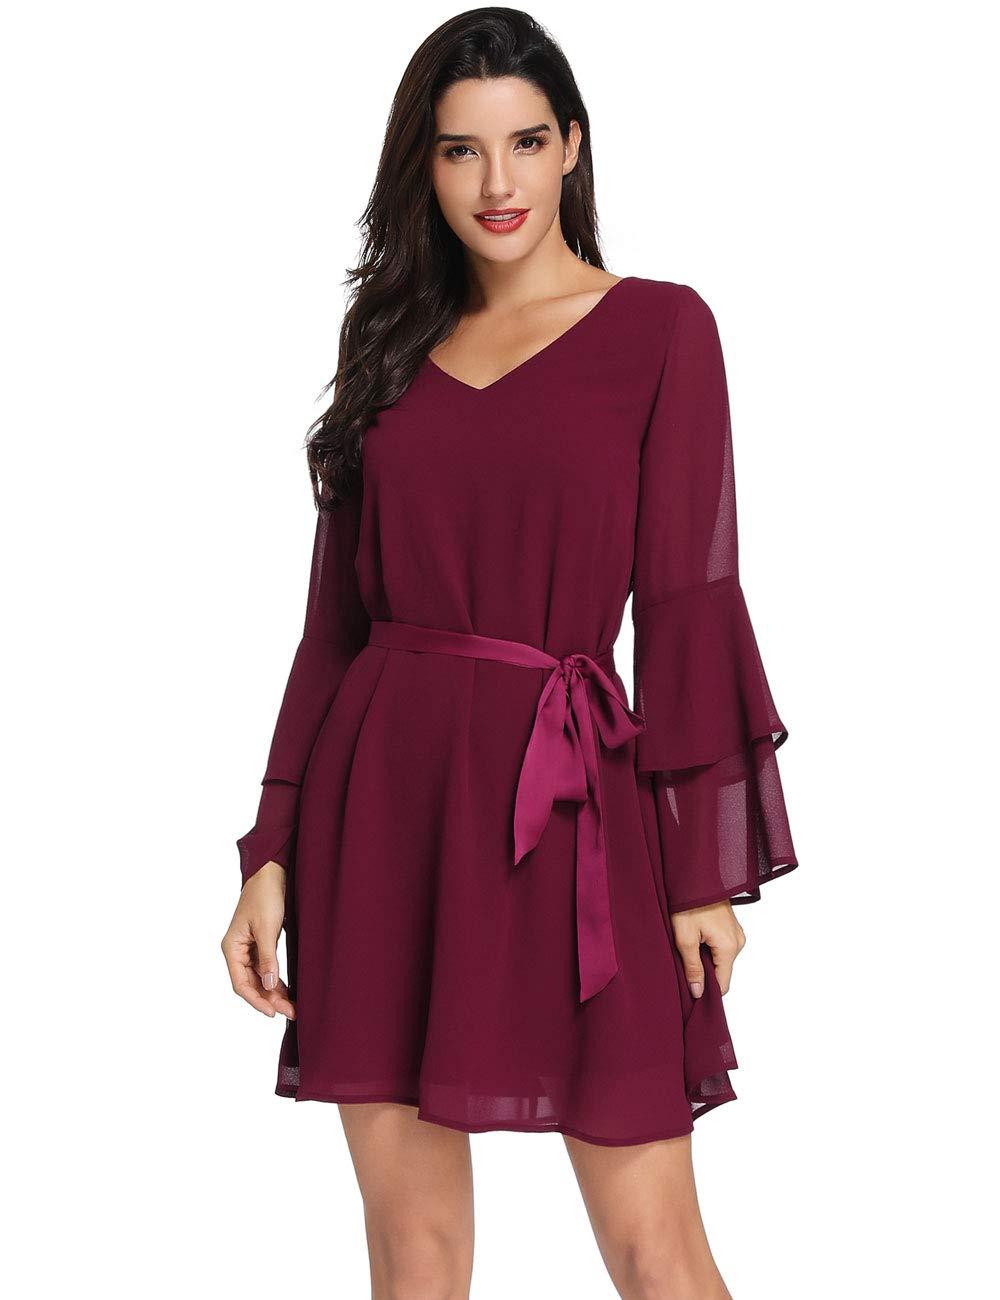 Azalosie Womens Long Sleeve Tunic Dress V Neck Summer Chiffon Short  Cocktail Casual Evening Loose Swing Solid Dress